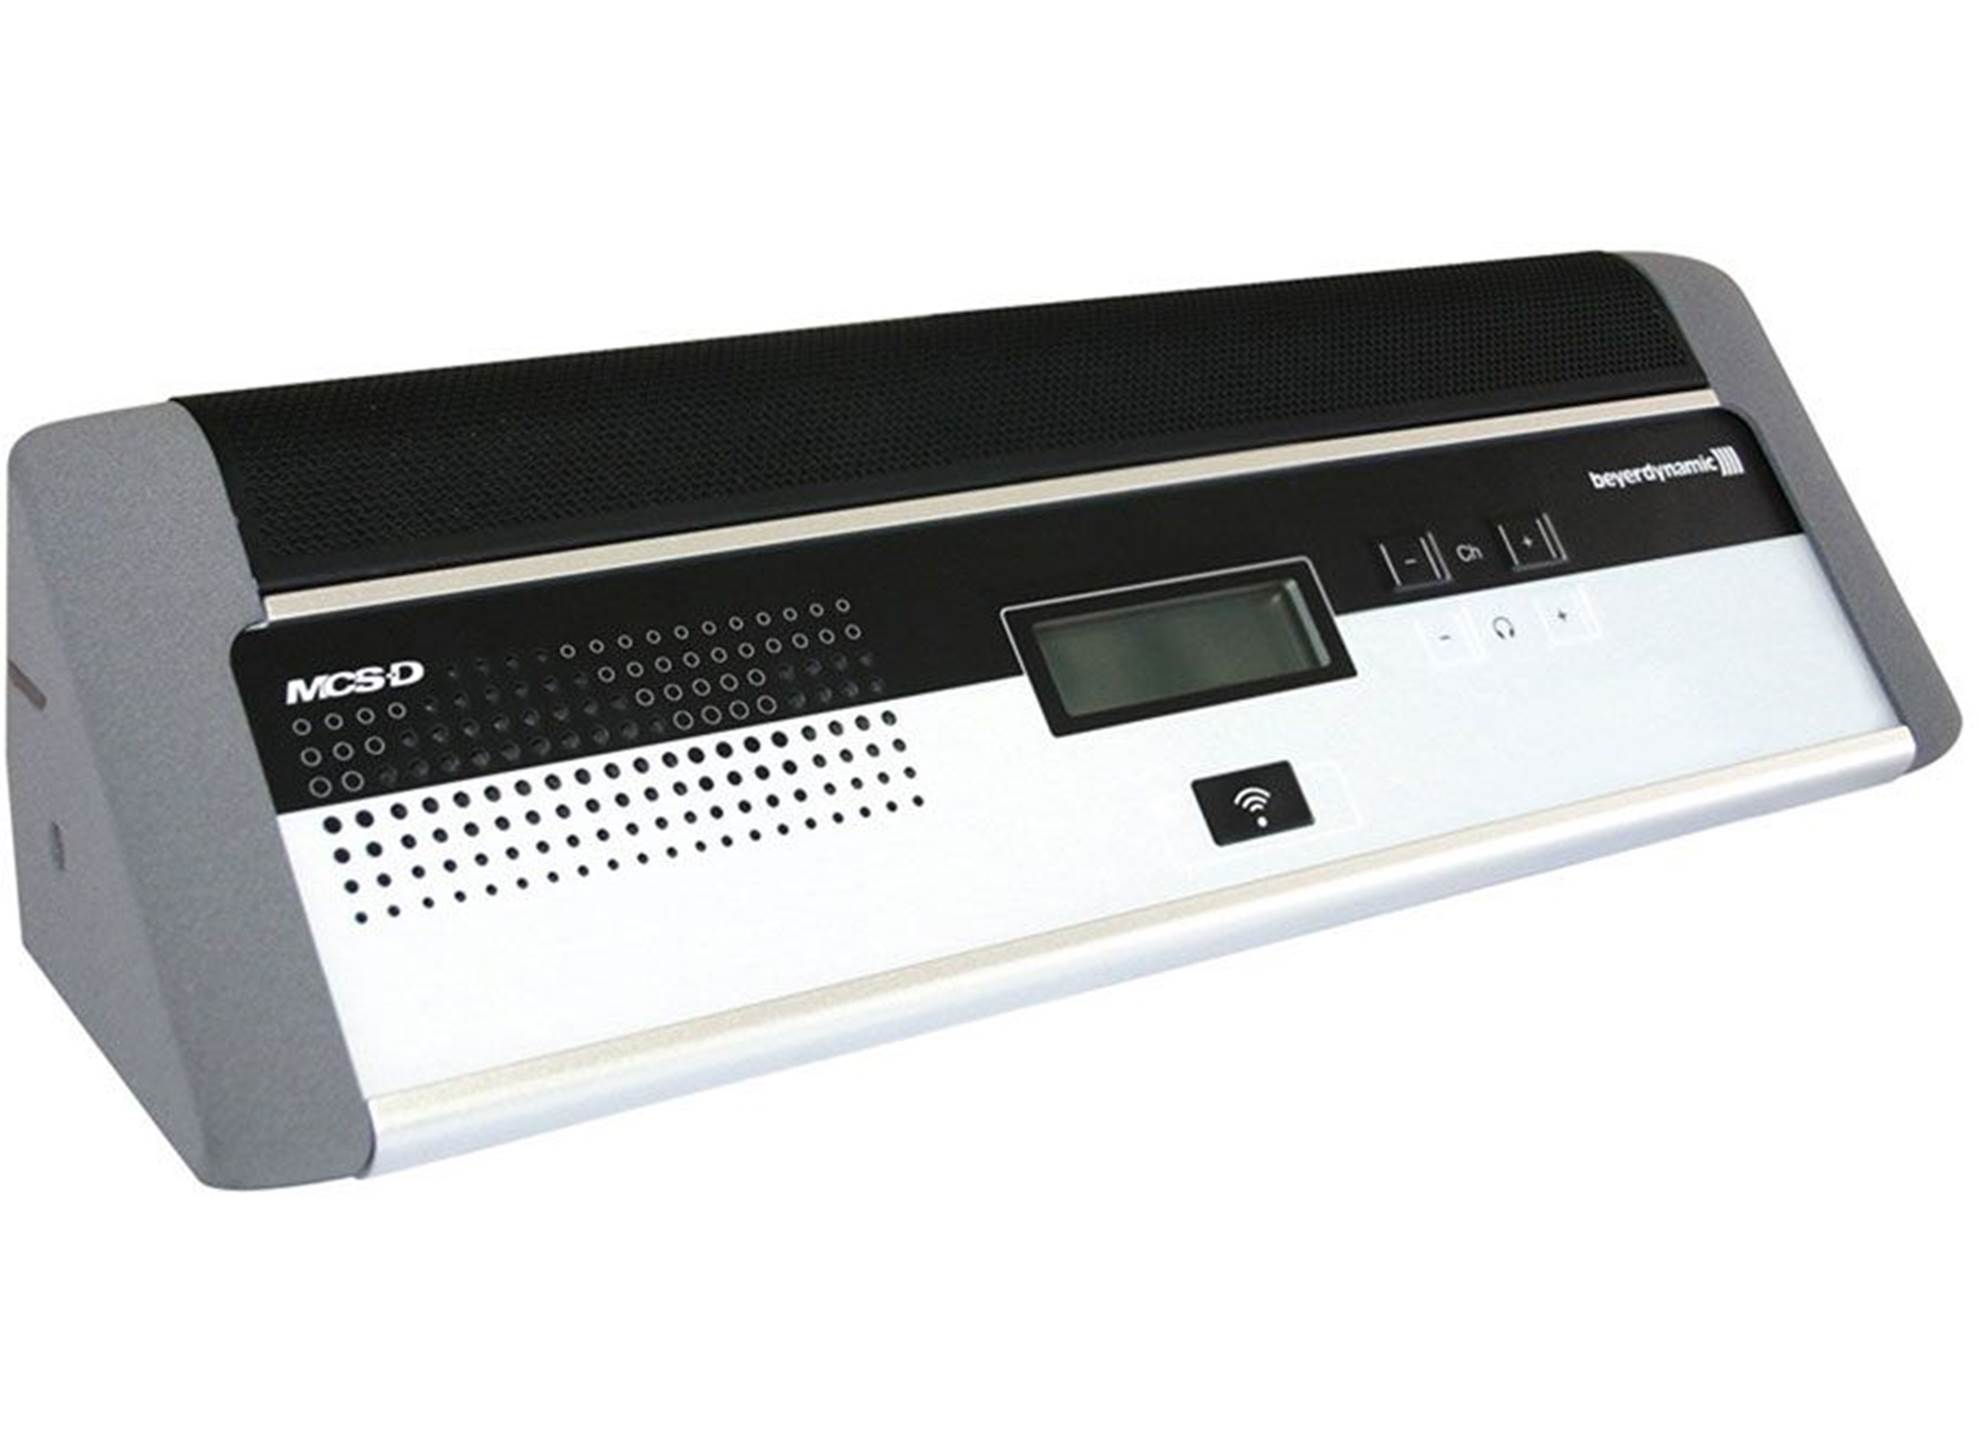 MCS-D 3141